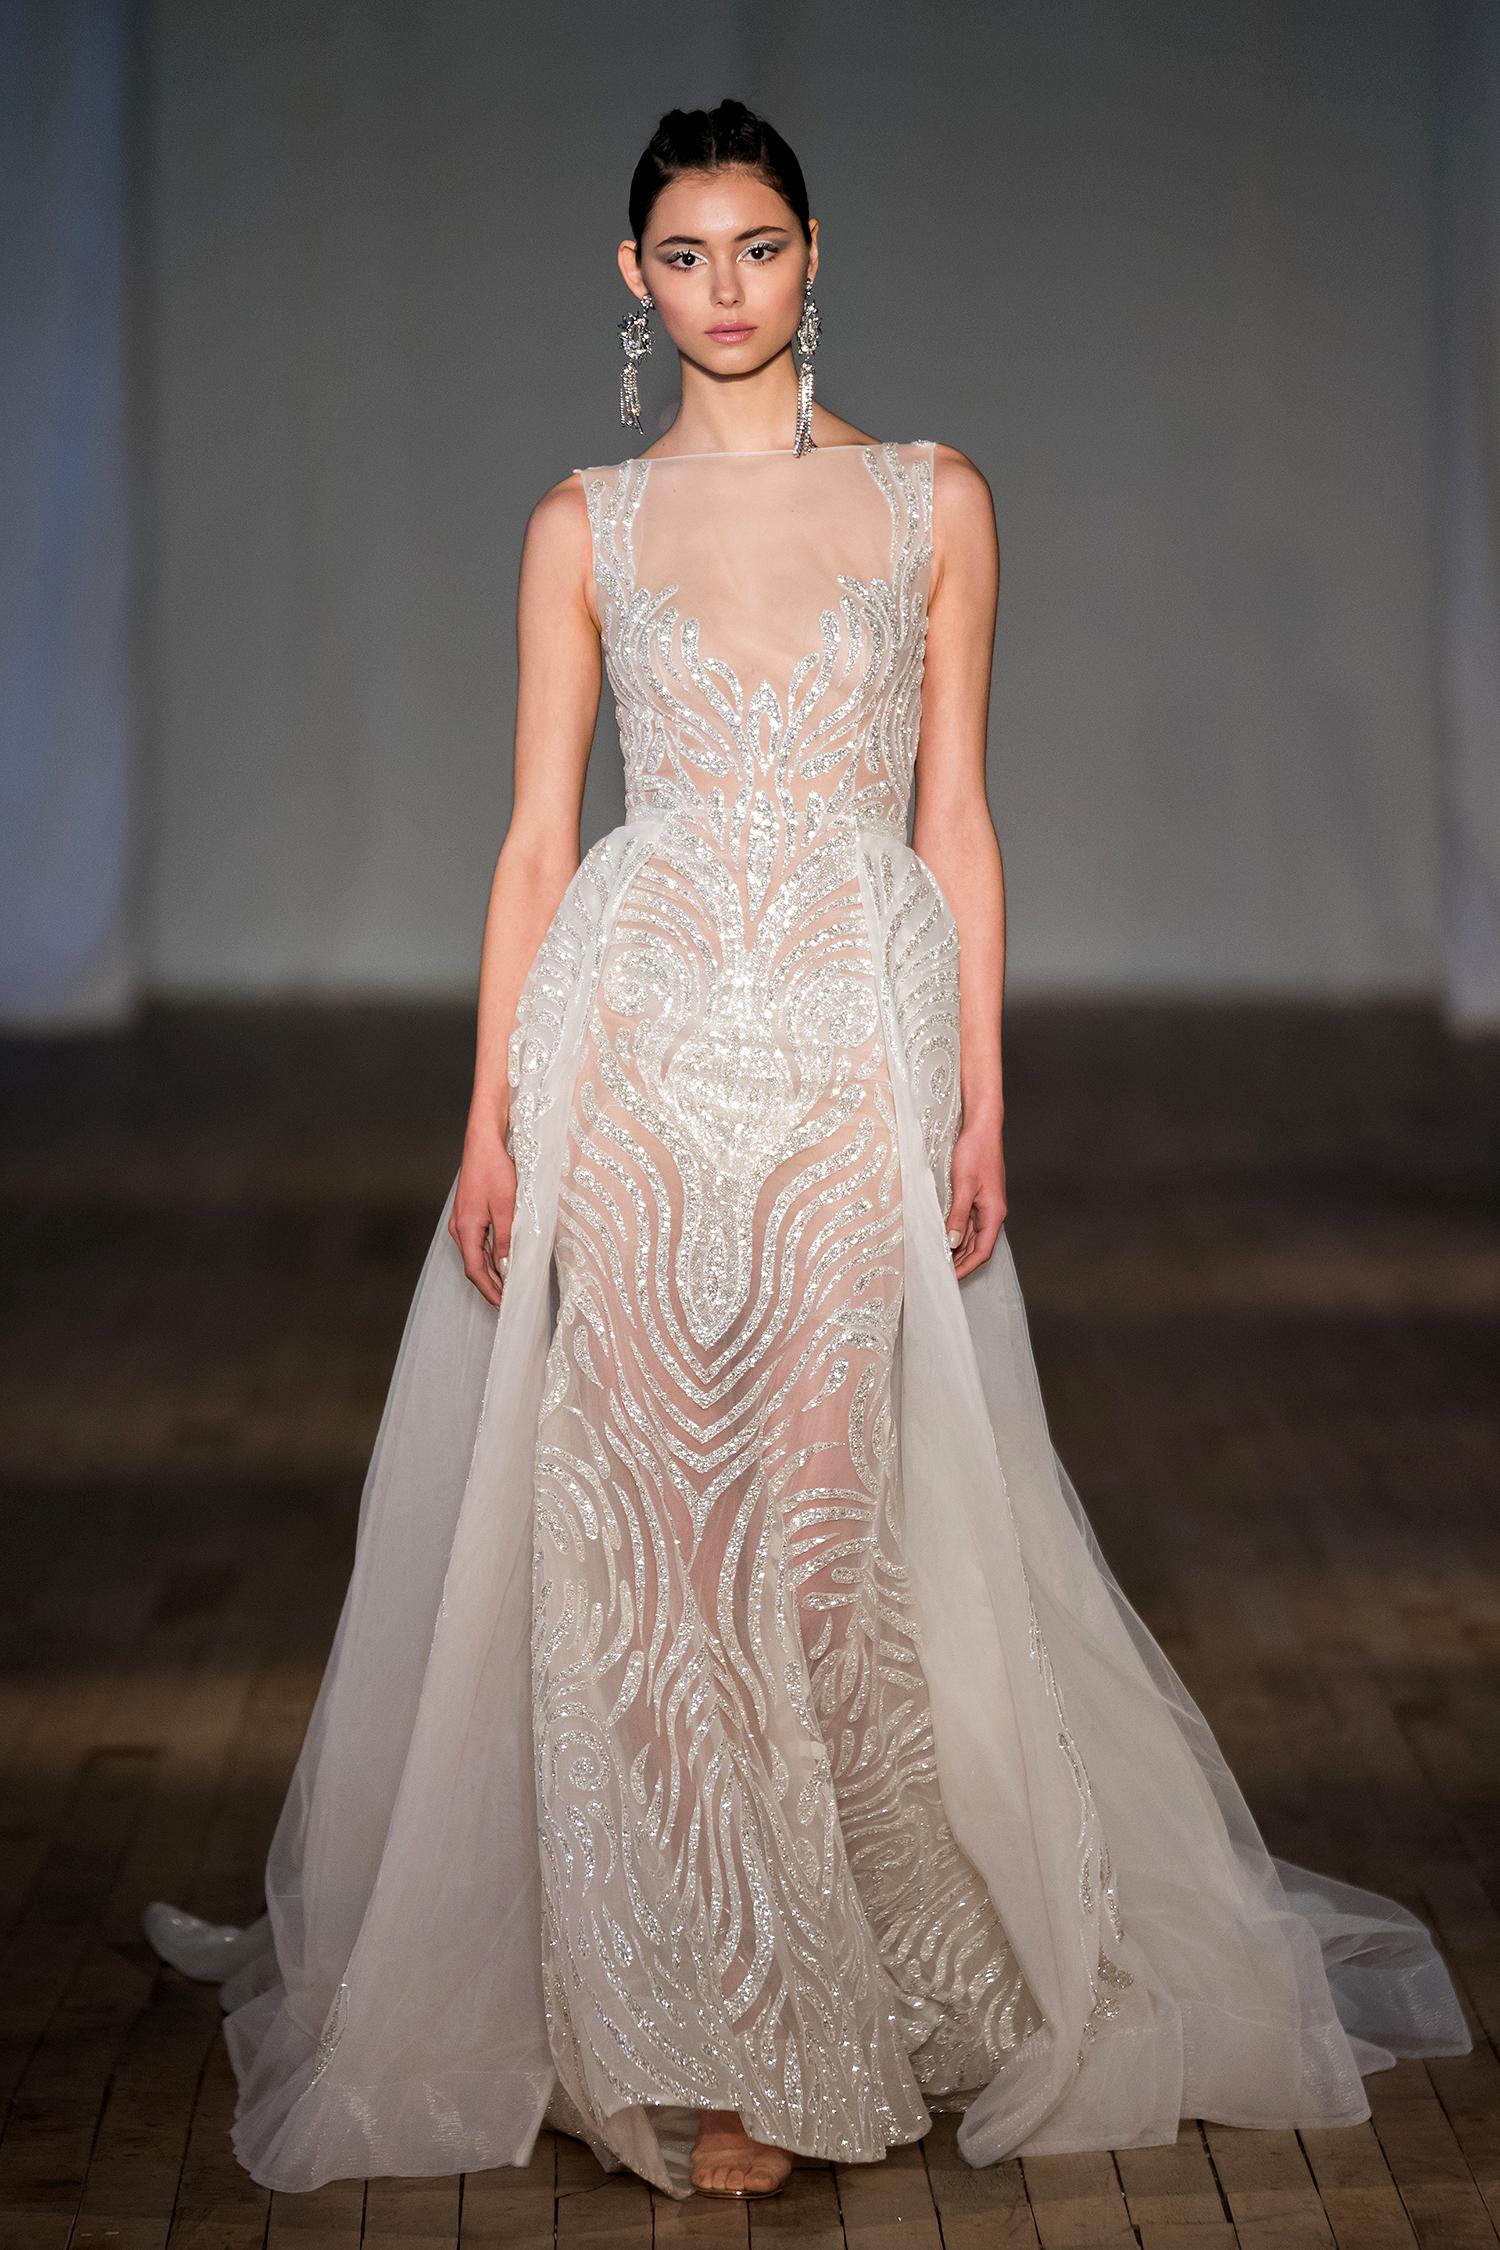 berta wedding dress spring 2019 crystal high-neck skirt panels